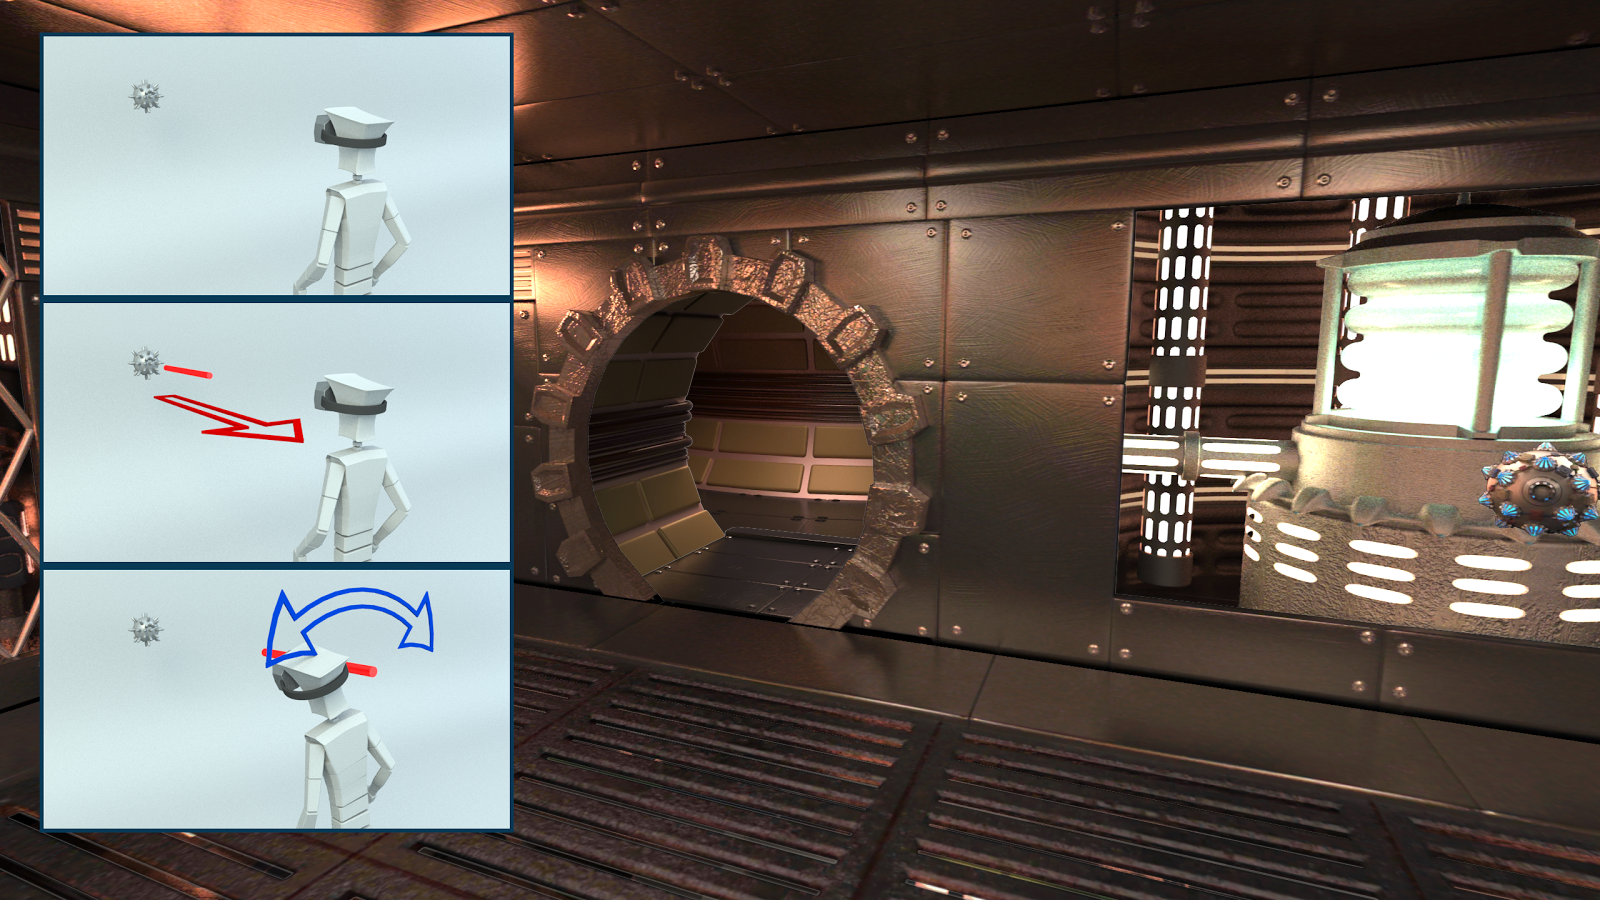 VR Laser Training 4 Cardboard 1 0 APK Download - Android Arcade Games